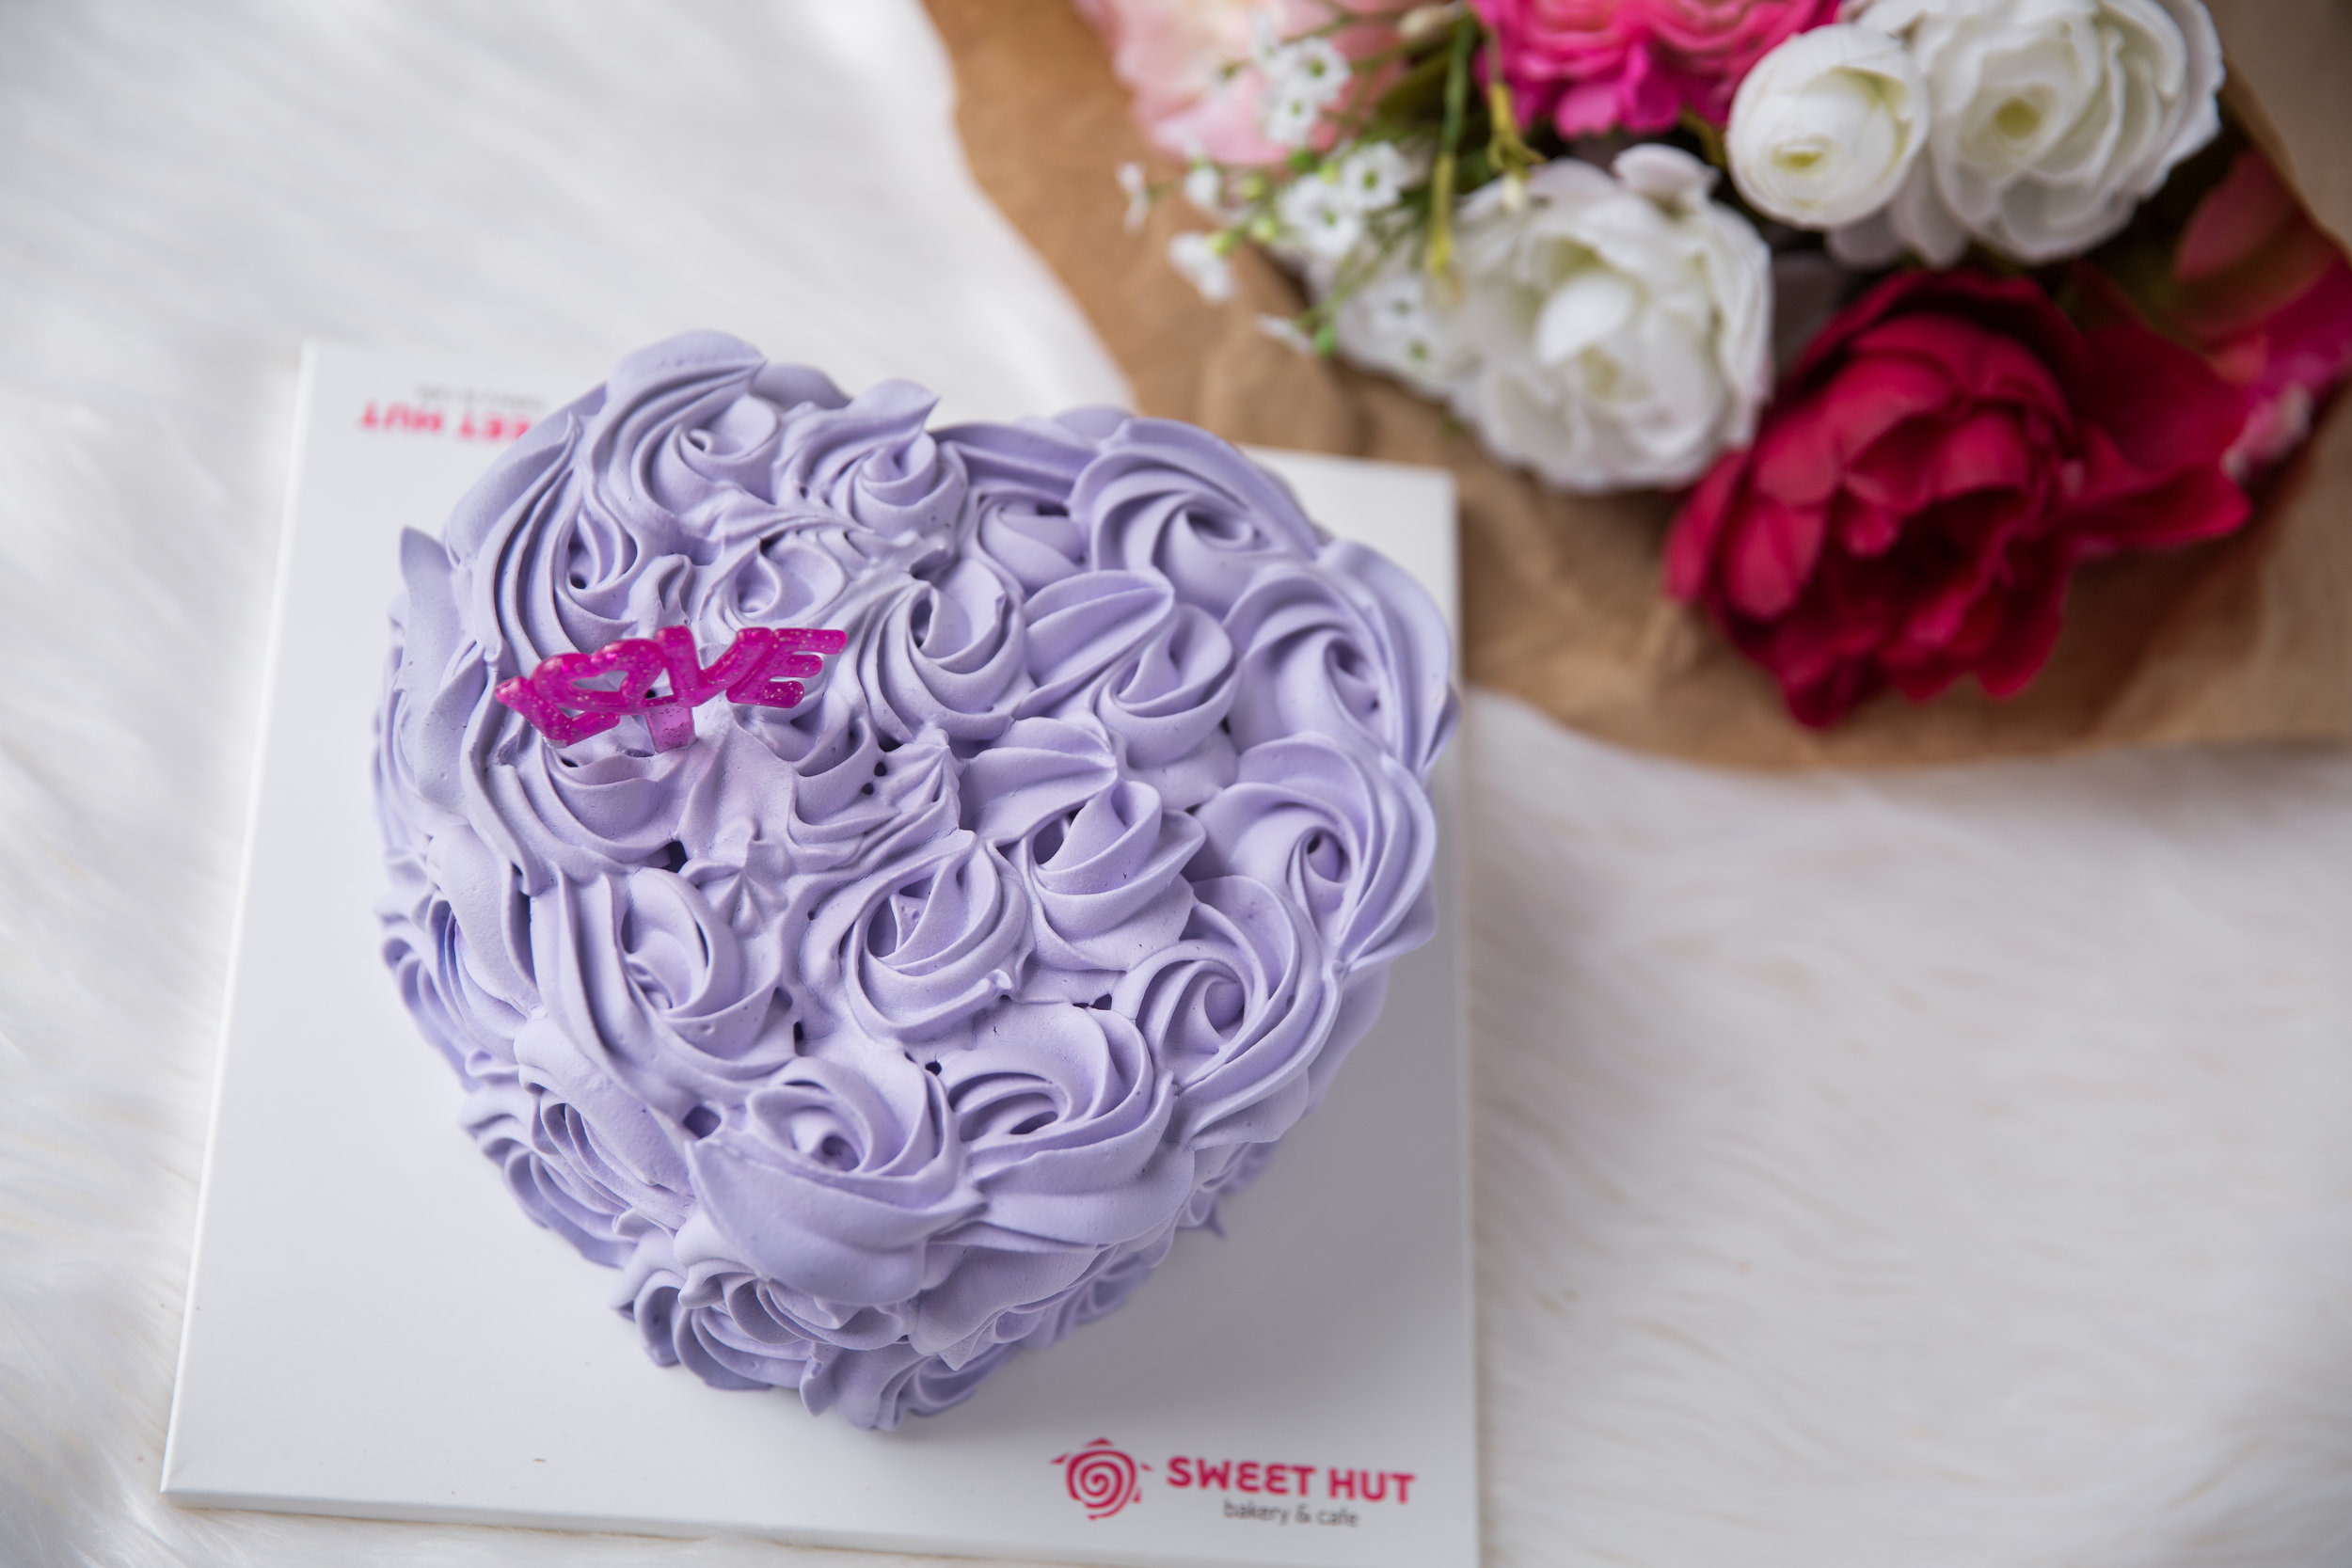 SH Valentine's Day Cakes-17.jpg